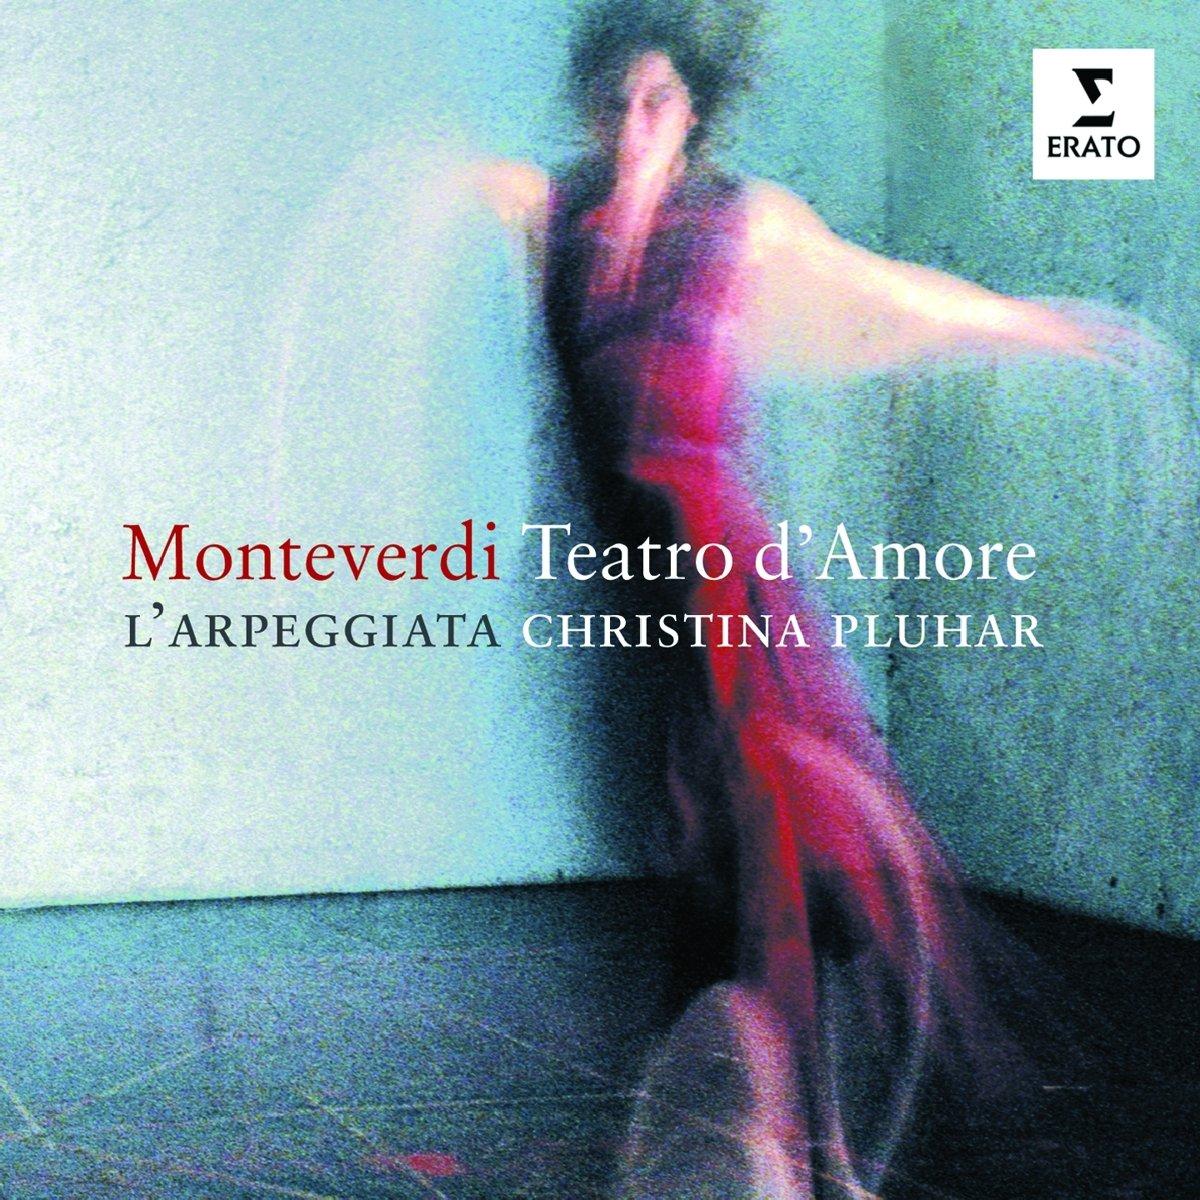 Monteverdi: Teatro d'Amore by Erato